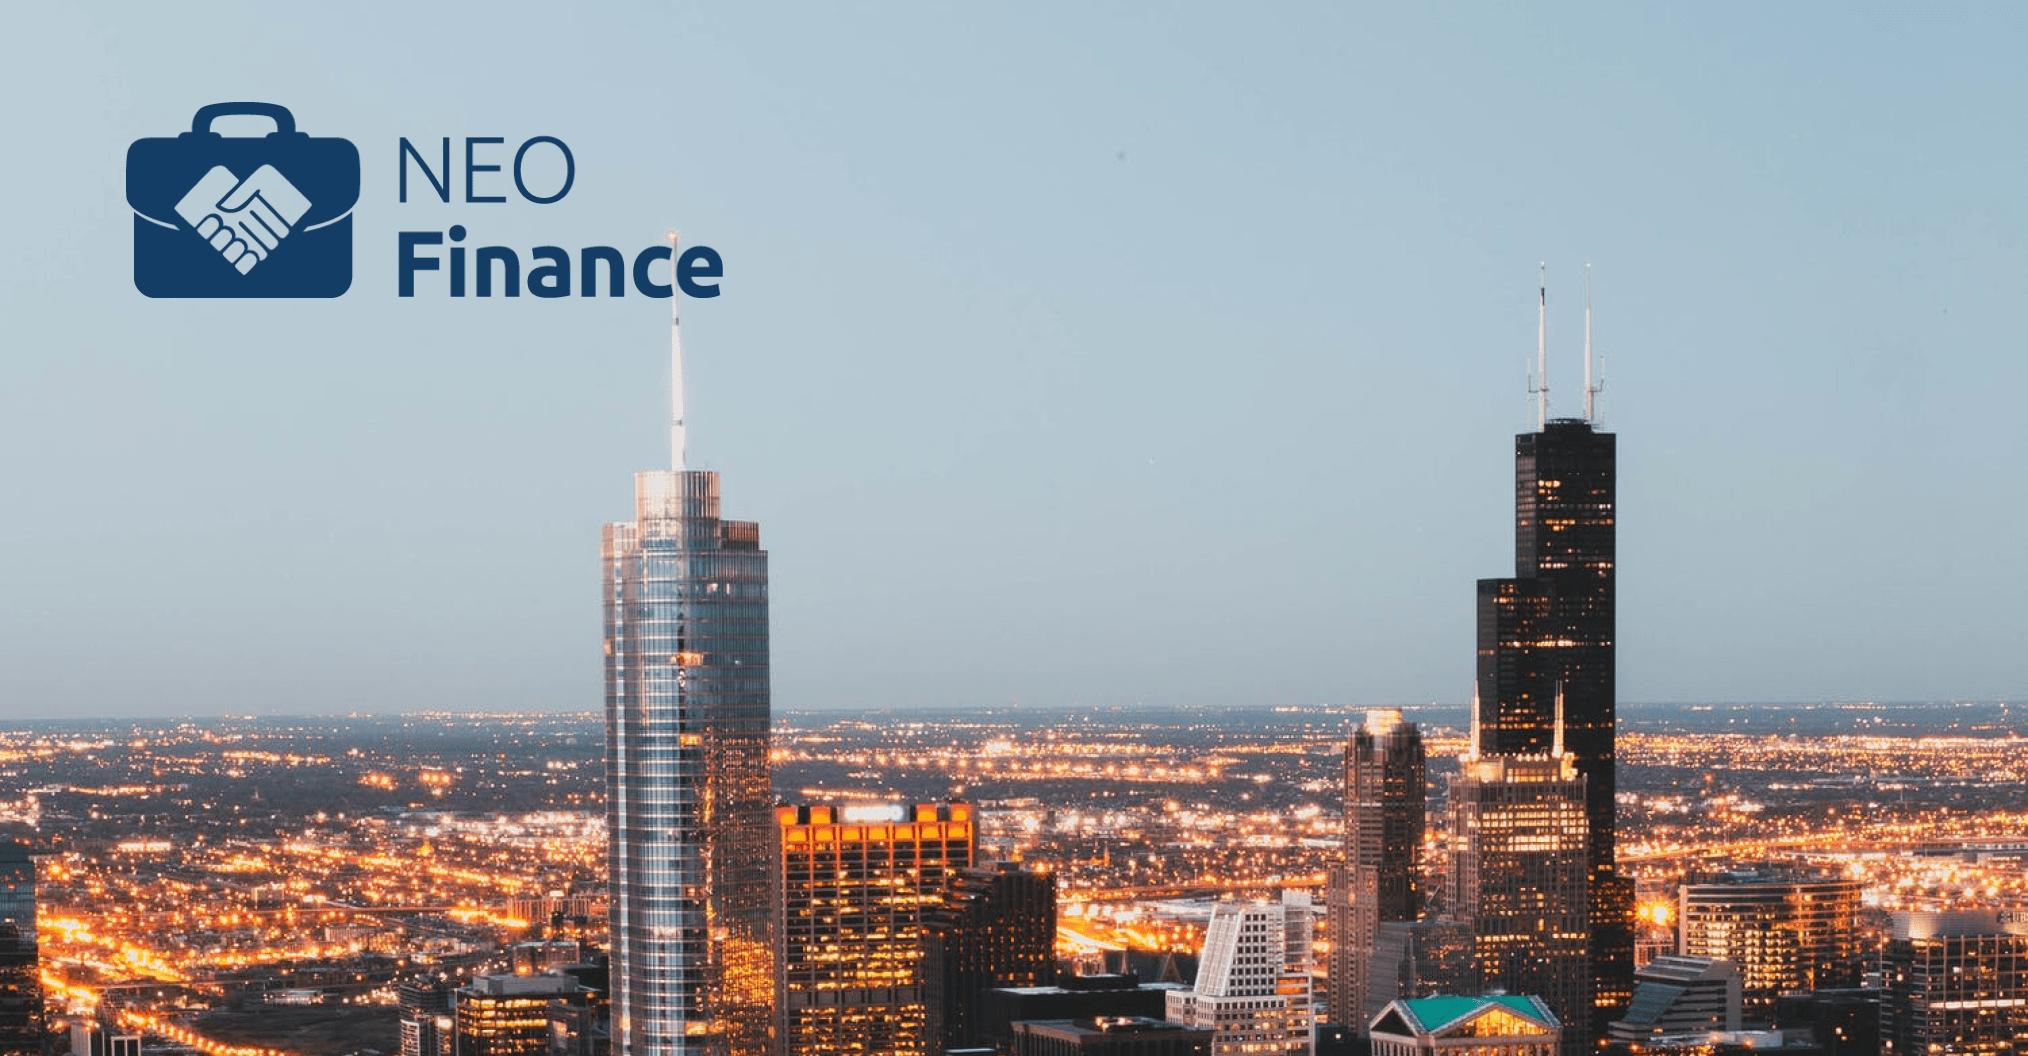 NEO Finance Case Study